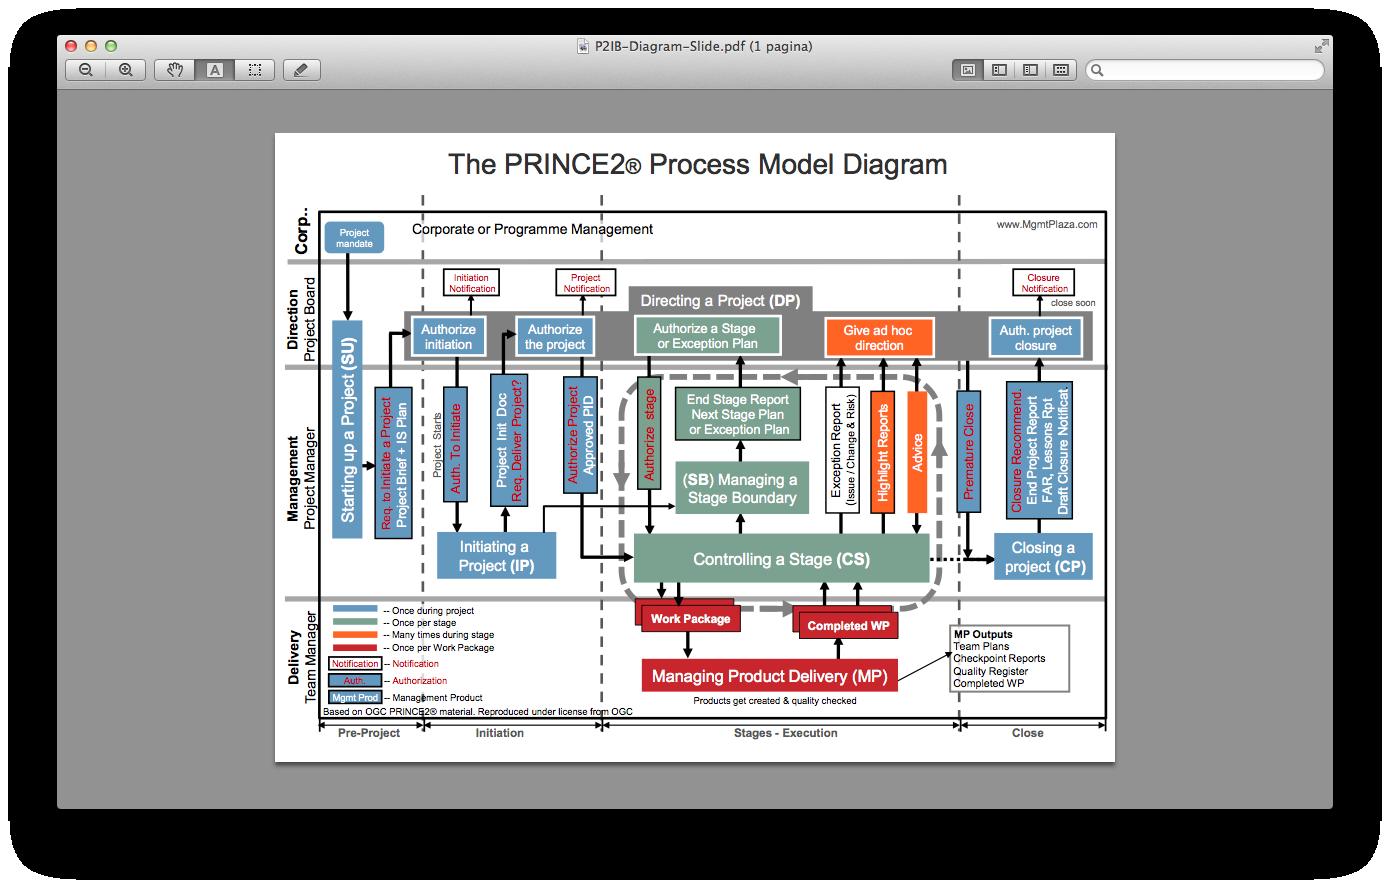 medium resolution of the prince2 process model diagram freank 2 png 1 390 888 pixels change management